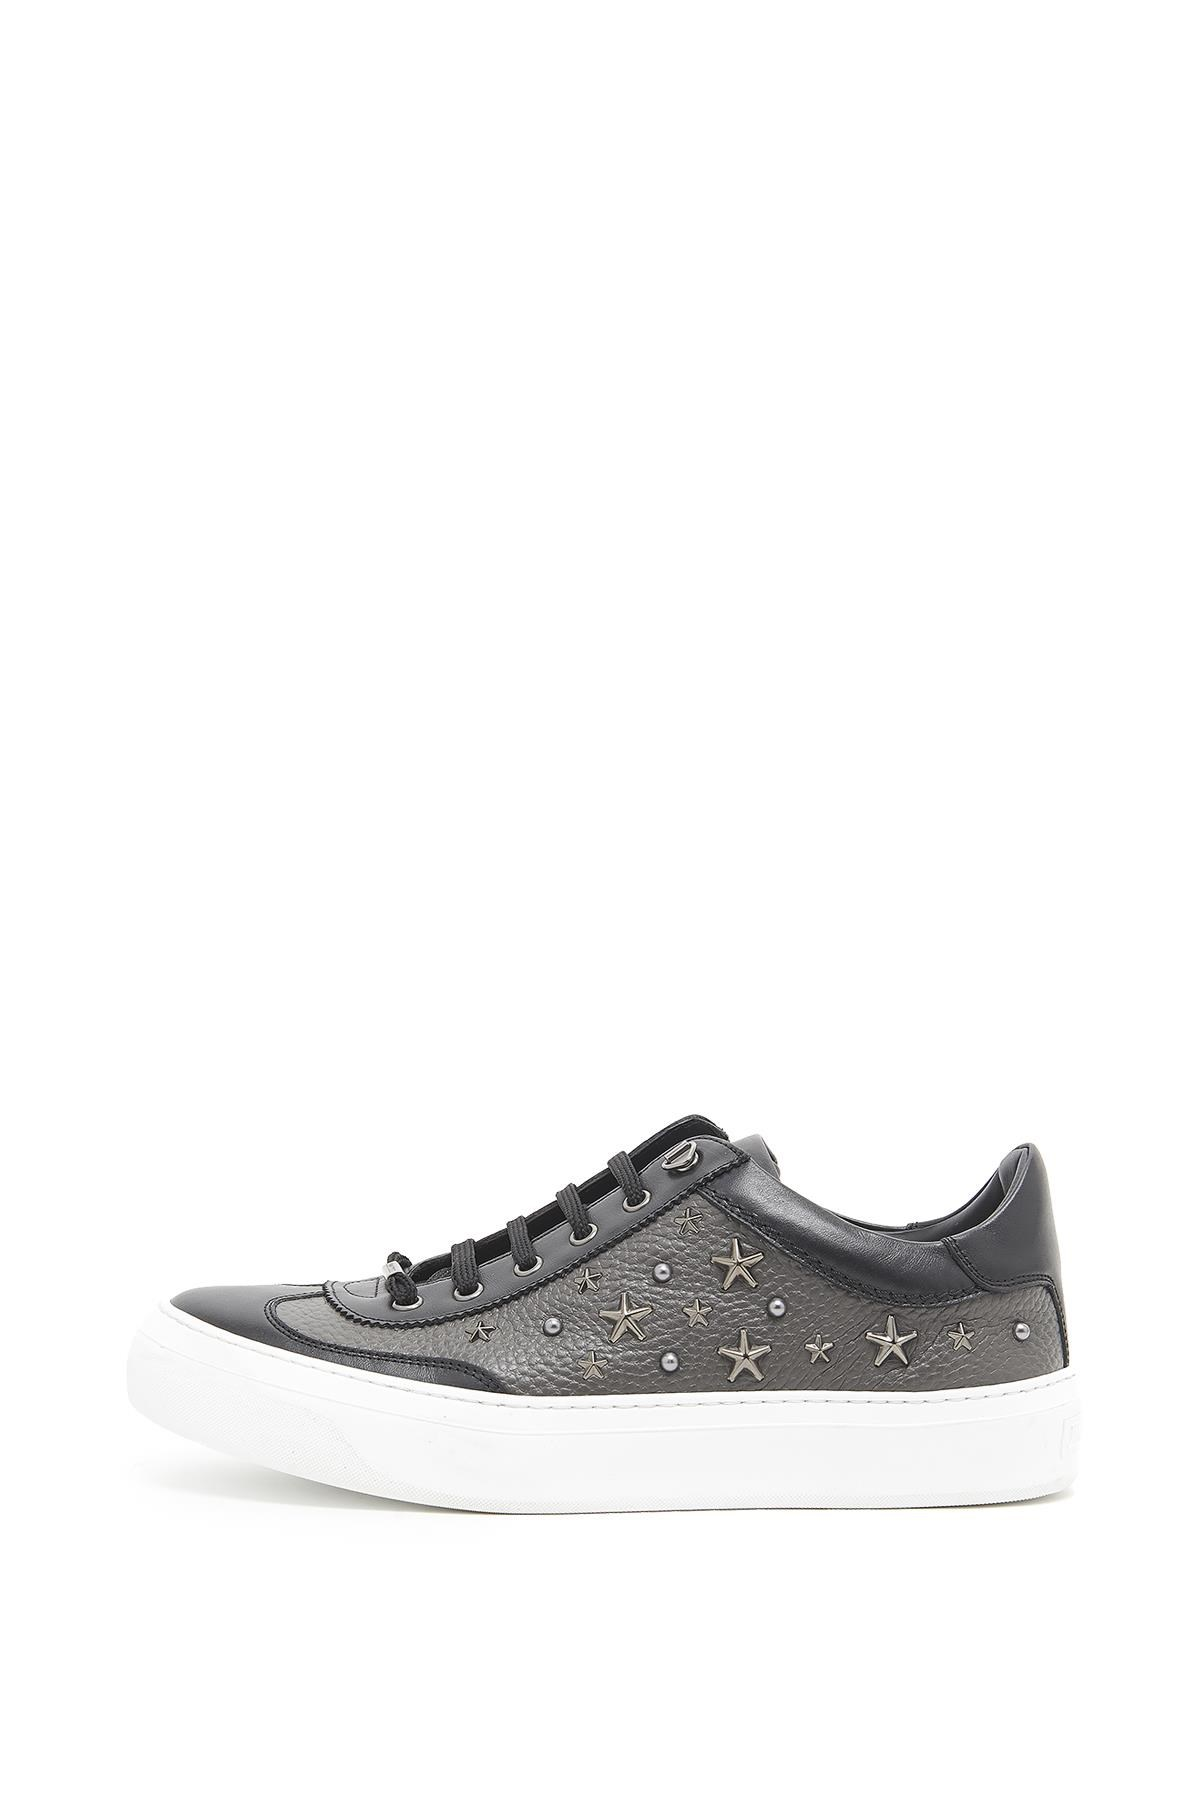 5b2259f5c319 jimmy choo  ace  sneakers available on julian-fashion.com - 48871